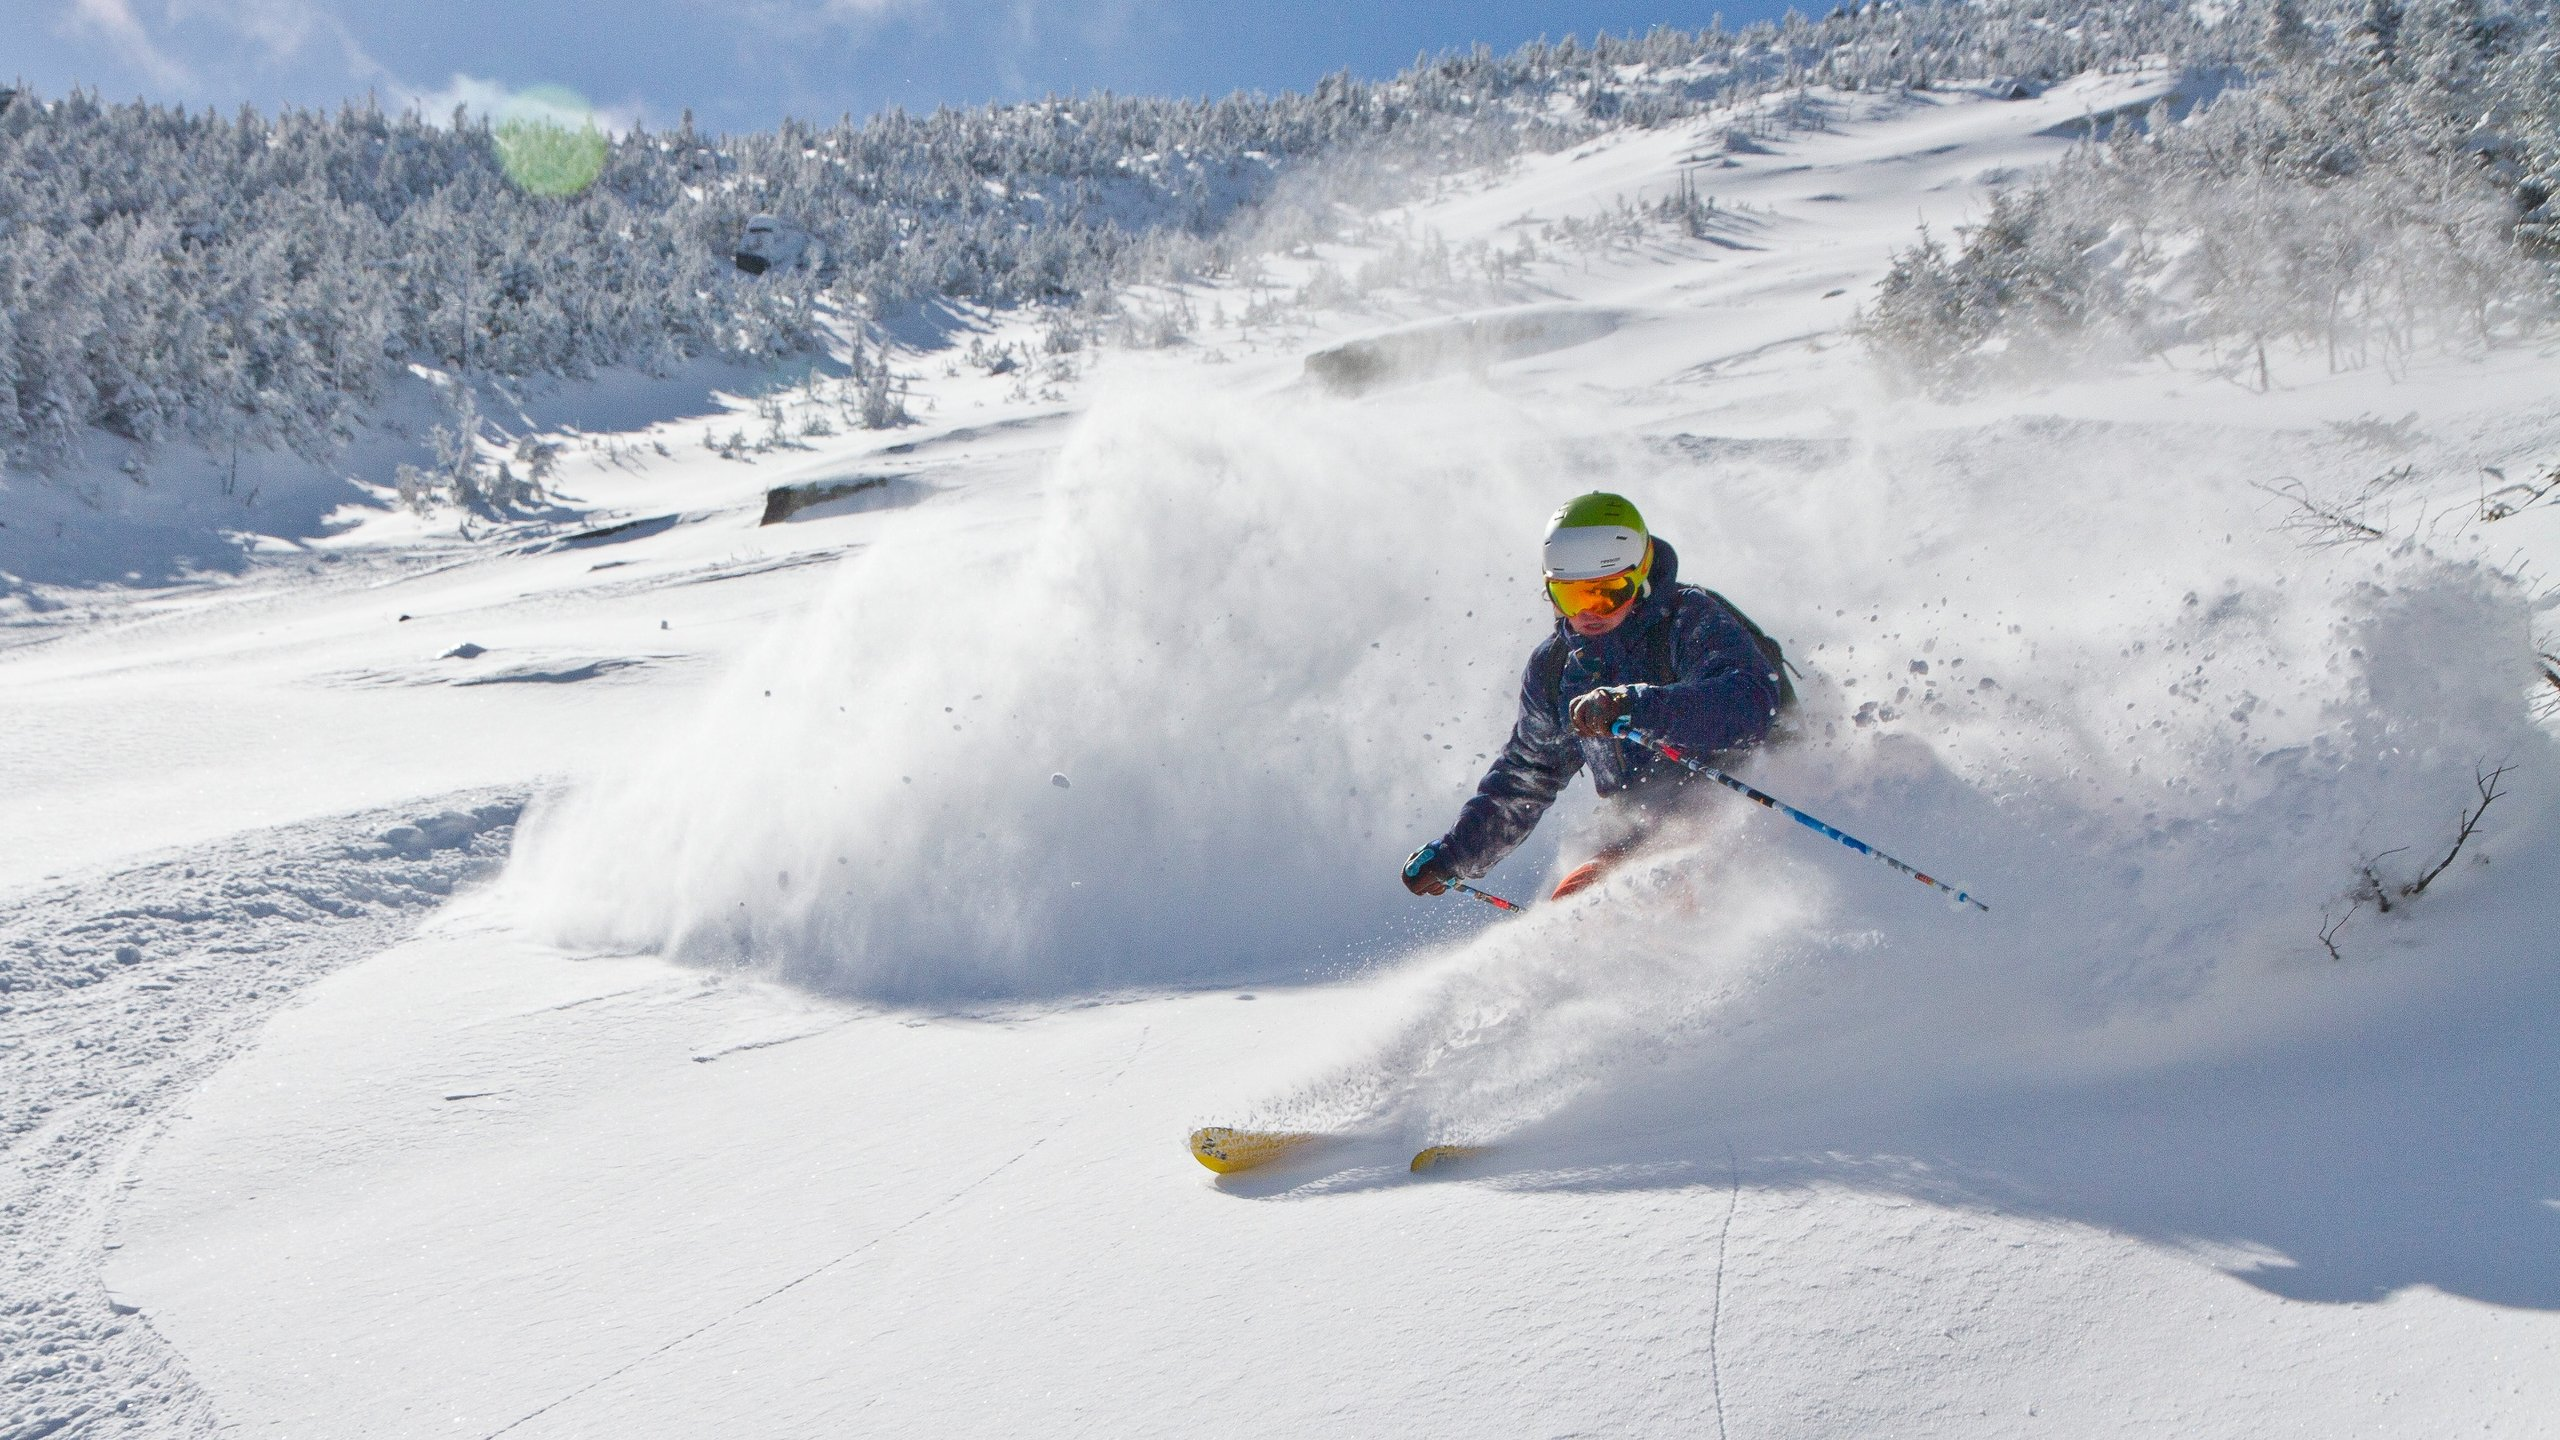 10 Best Lake Placid Ski Resorts Amp Hotels In 2019 Find Ski